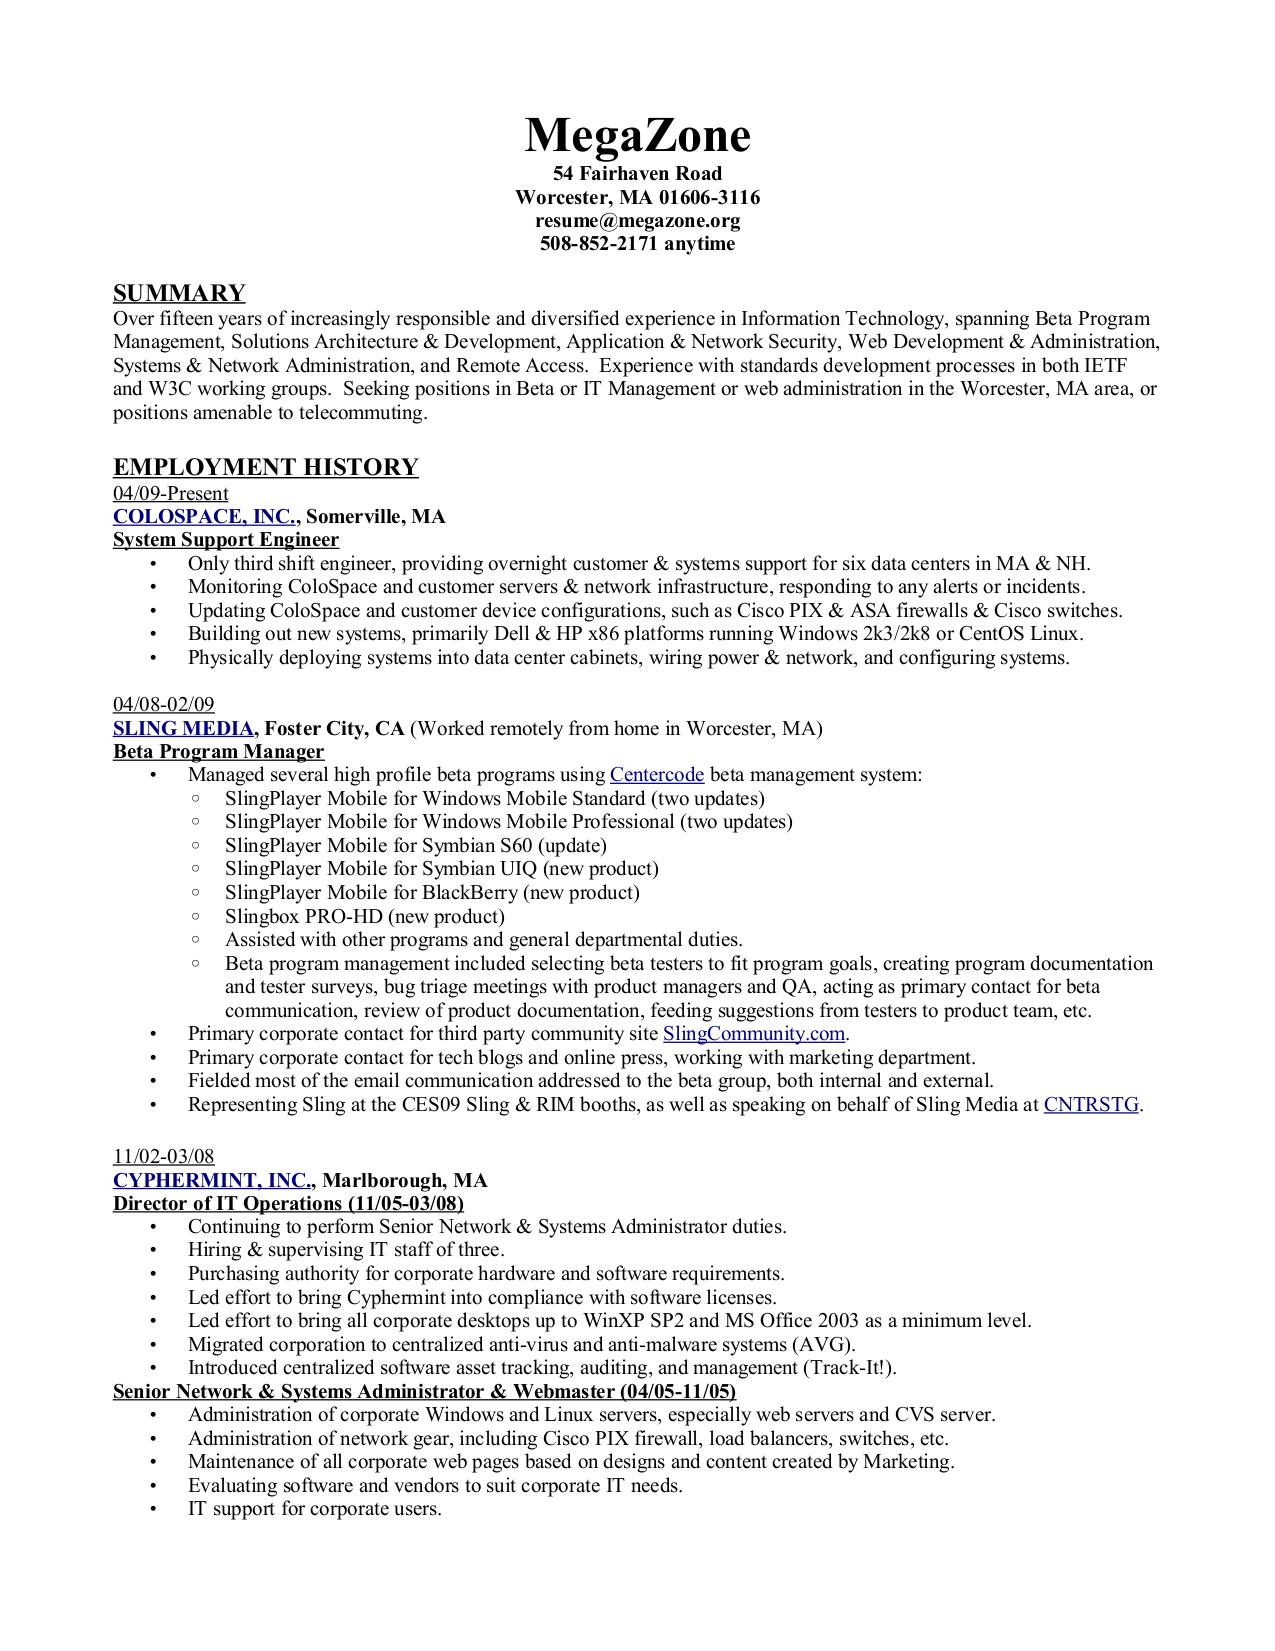 Technical architect resume sample